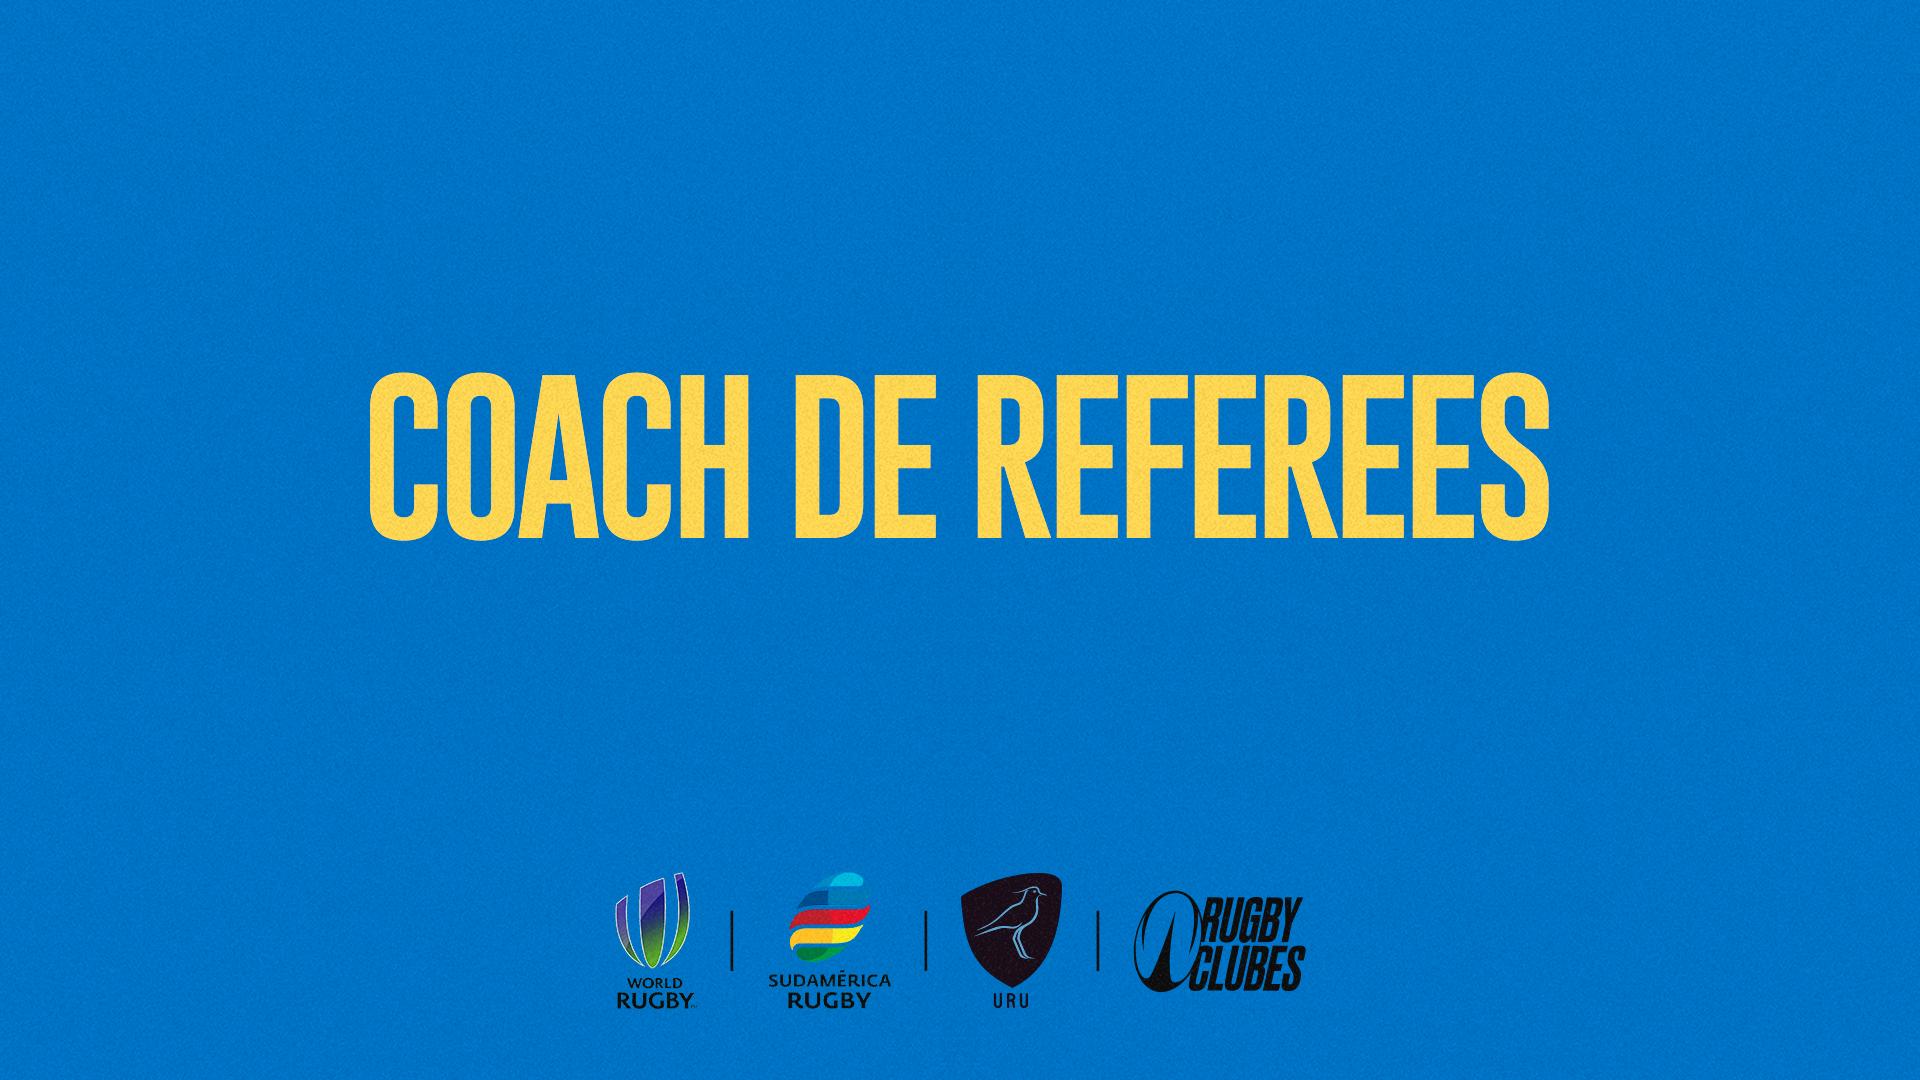 Coach de Referees